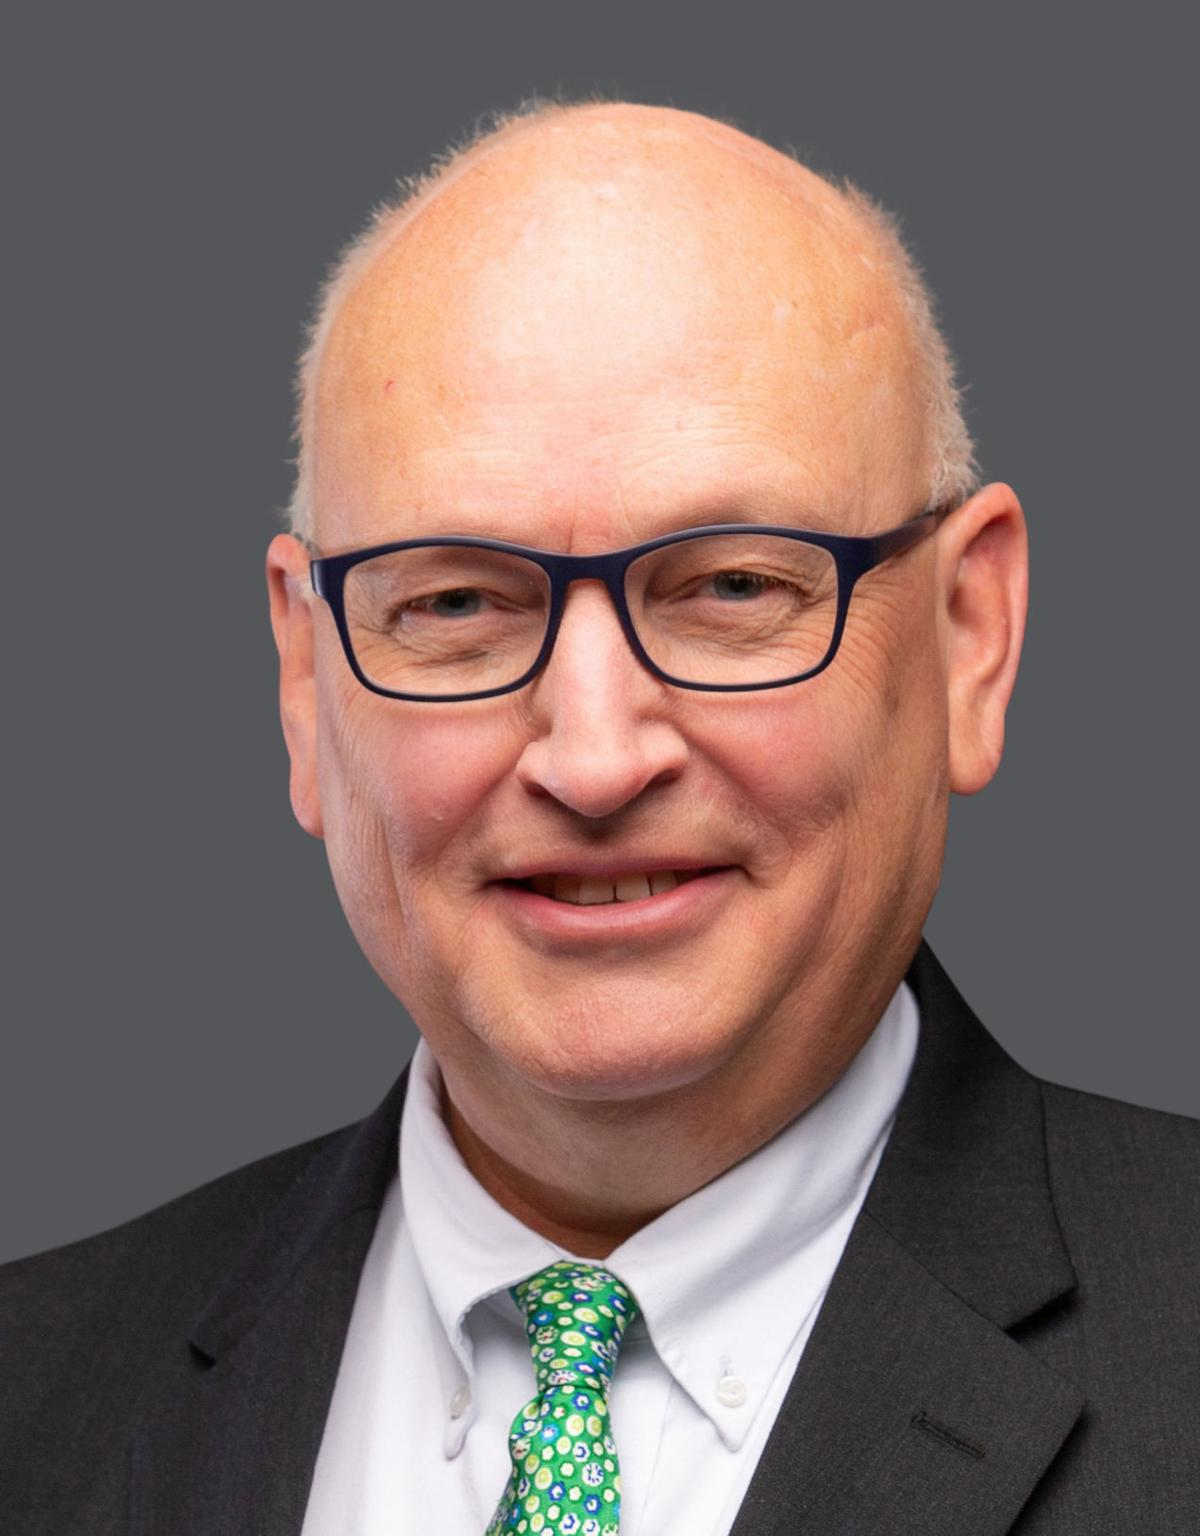 Blaine Pieper, CEO